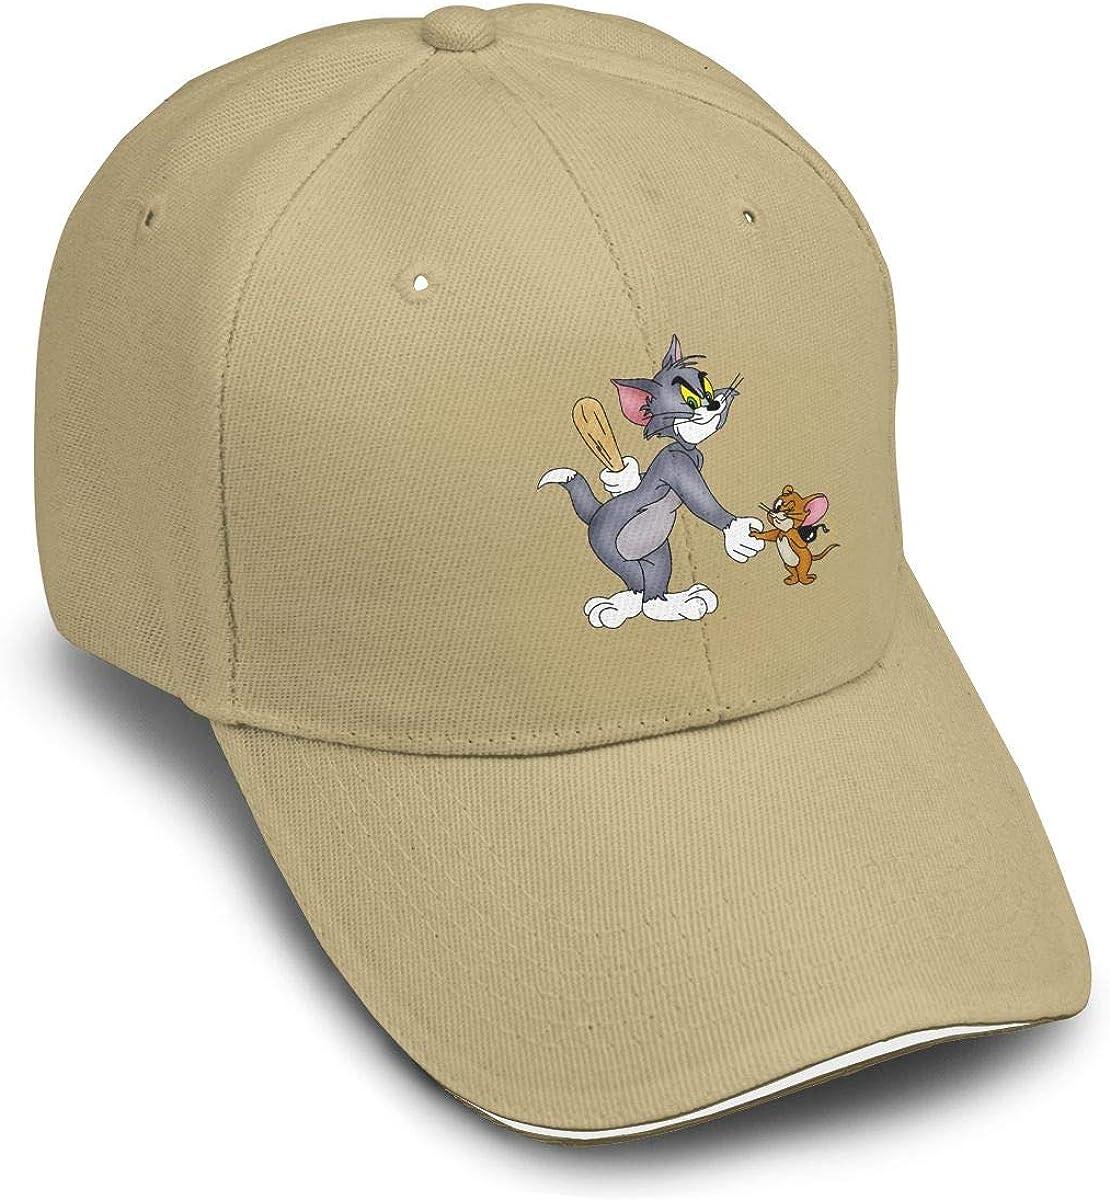 TicTicTok Tom Cat Jerry Mouse Men Women Thin and Adjustable Casquette White